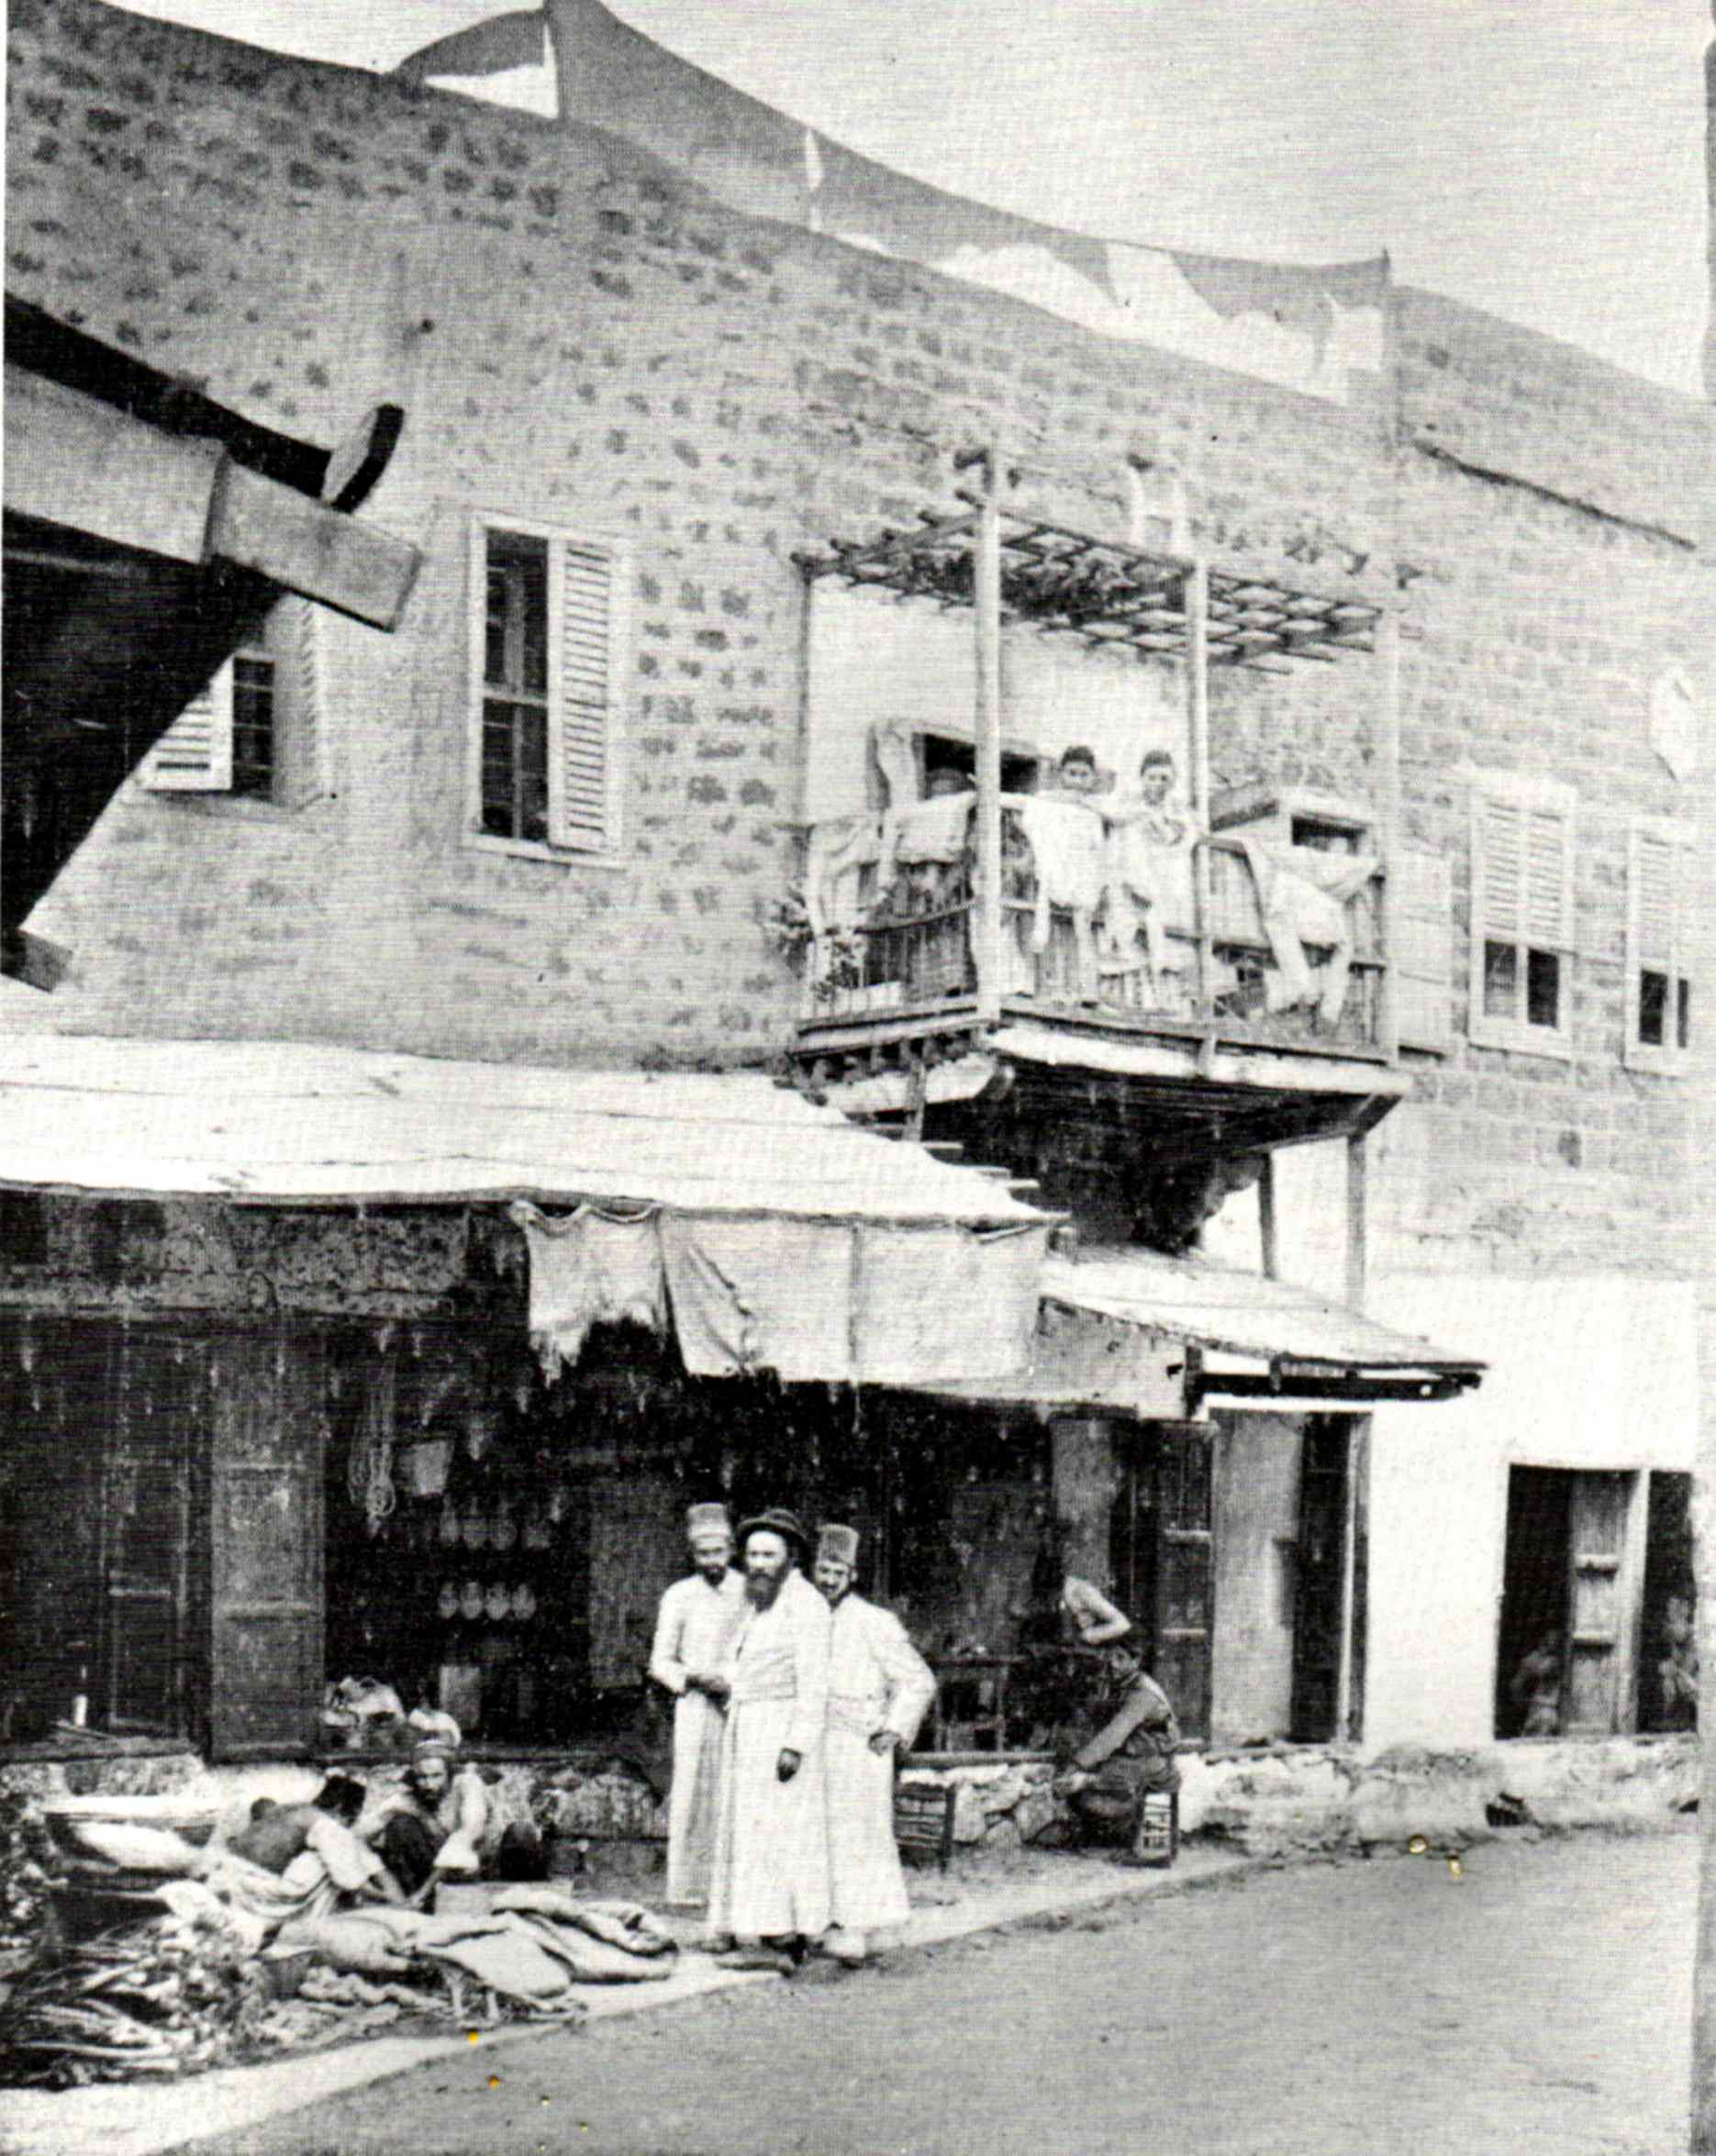 Iran Azad نگاهي تاريخي به تصاوير Quot جليله و Quot در فلسطين